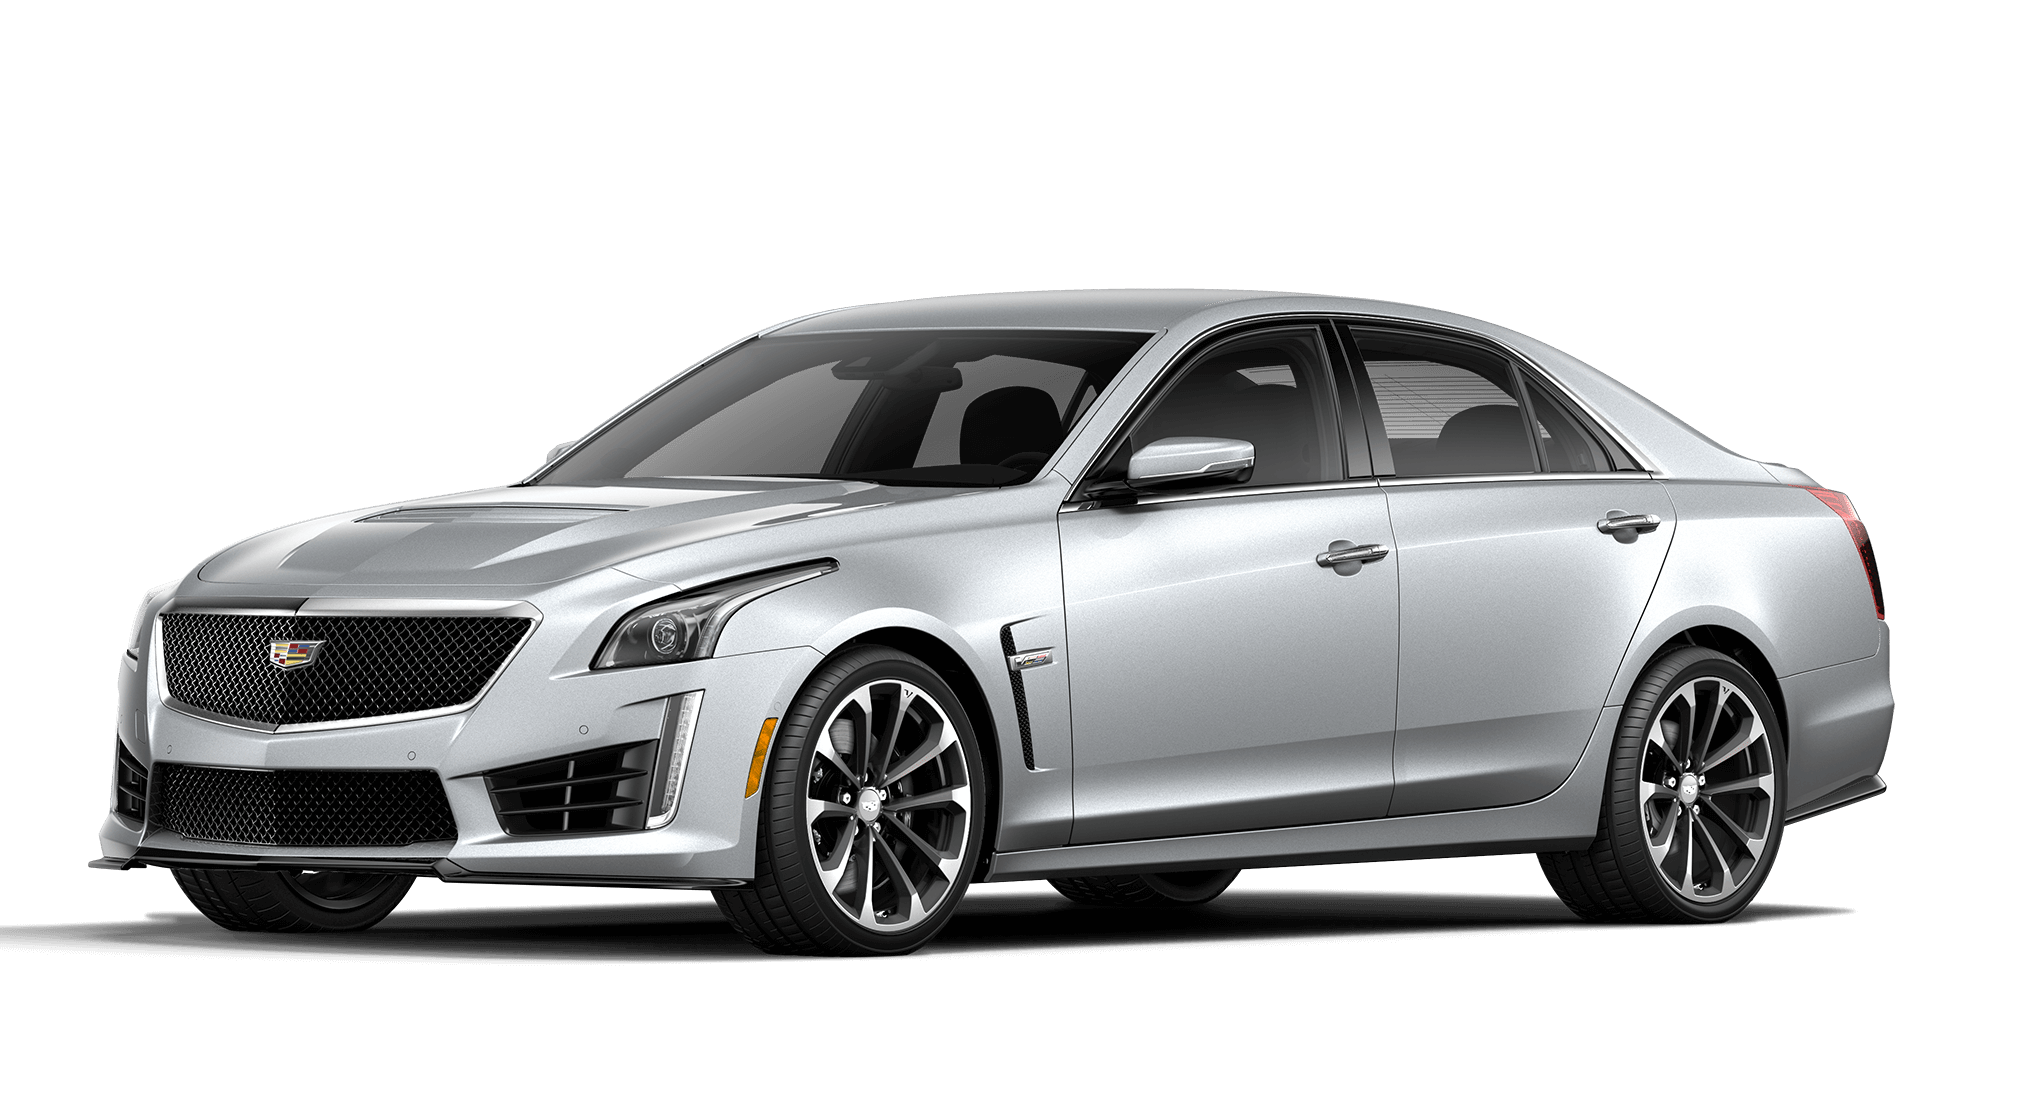 Radiant Silver Cadillac CTS-V